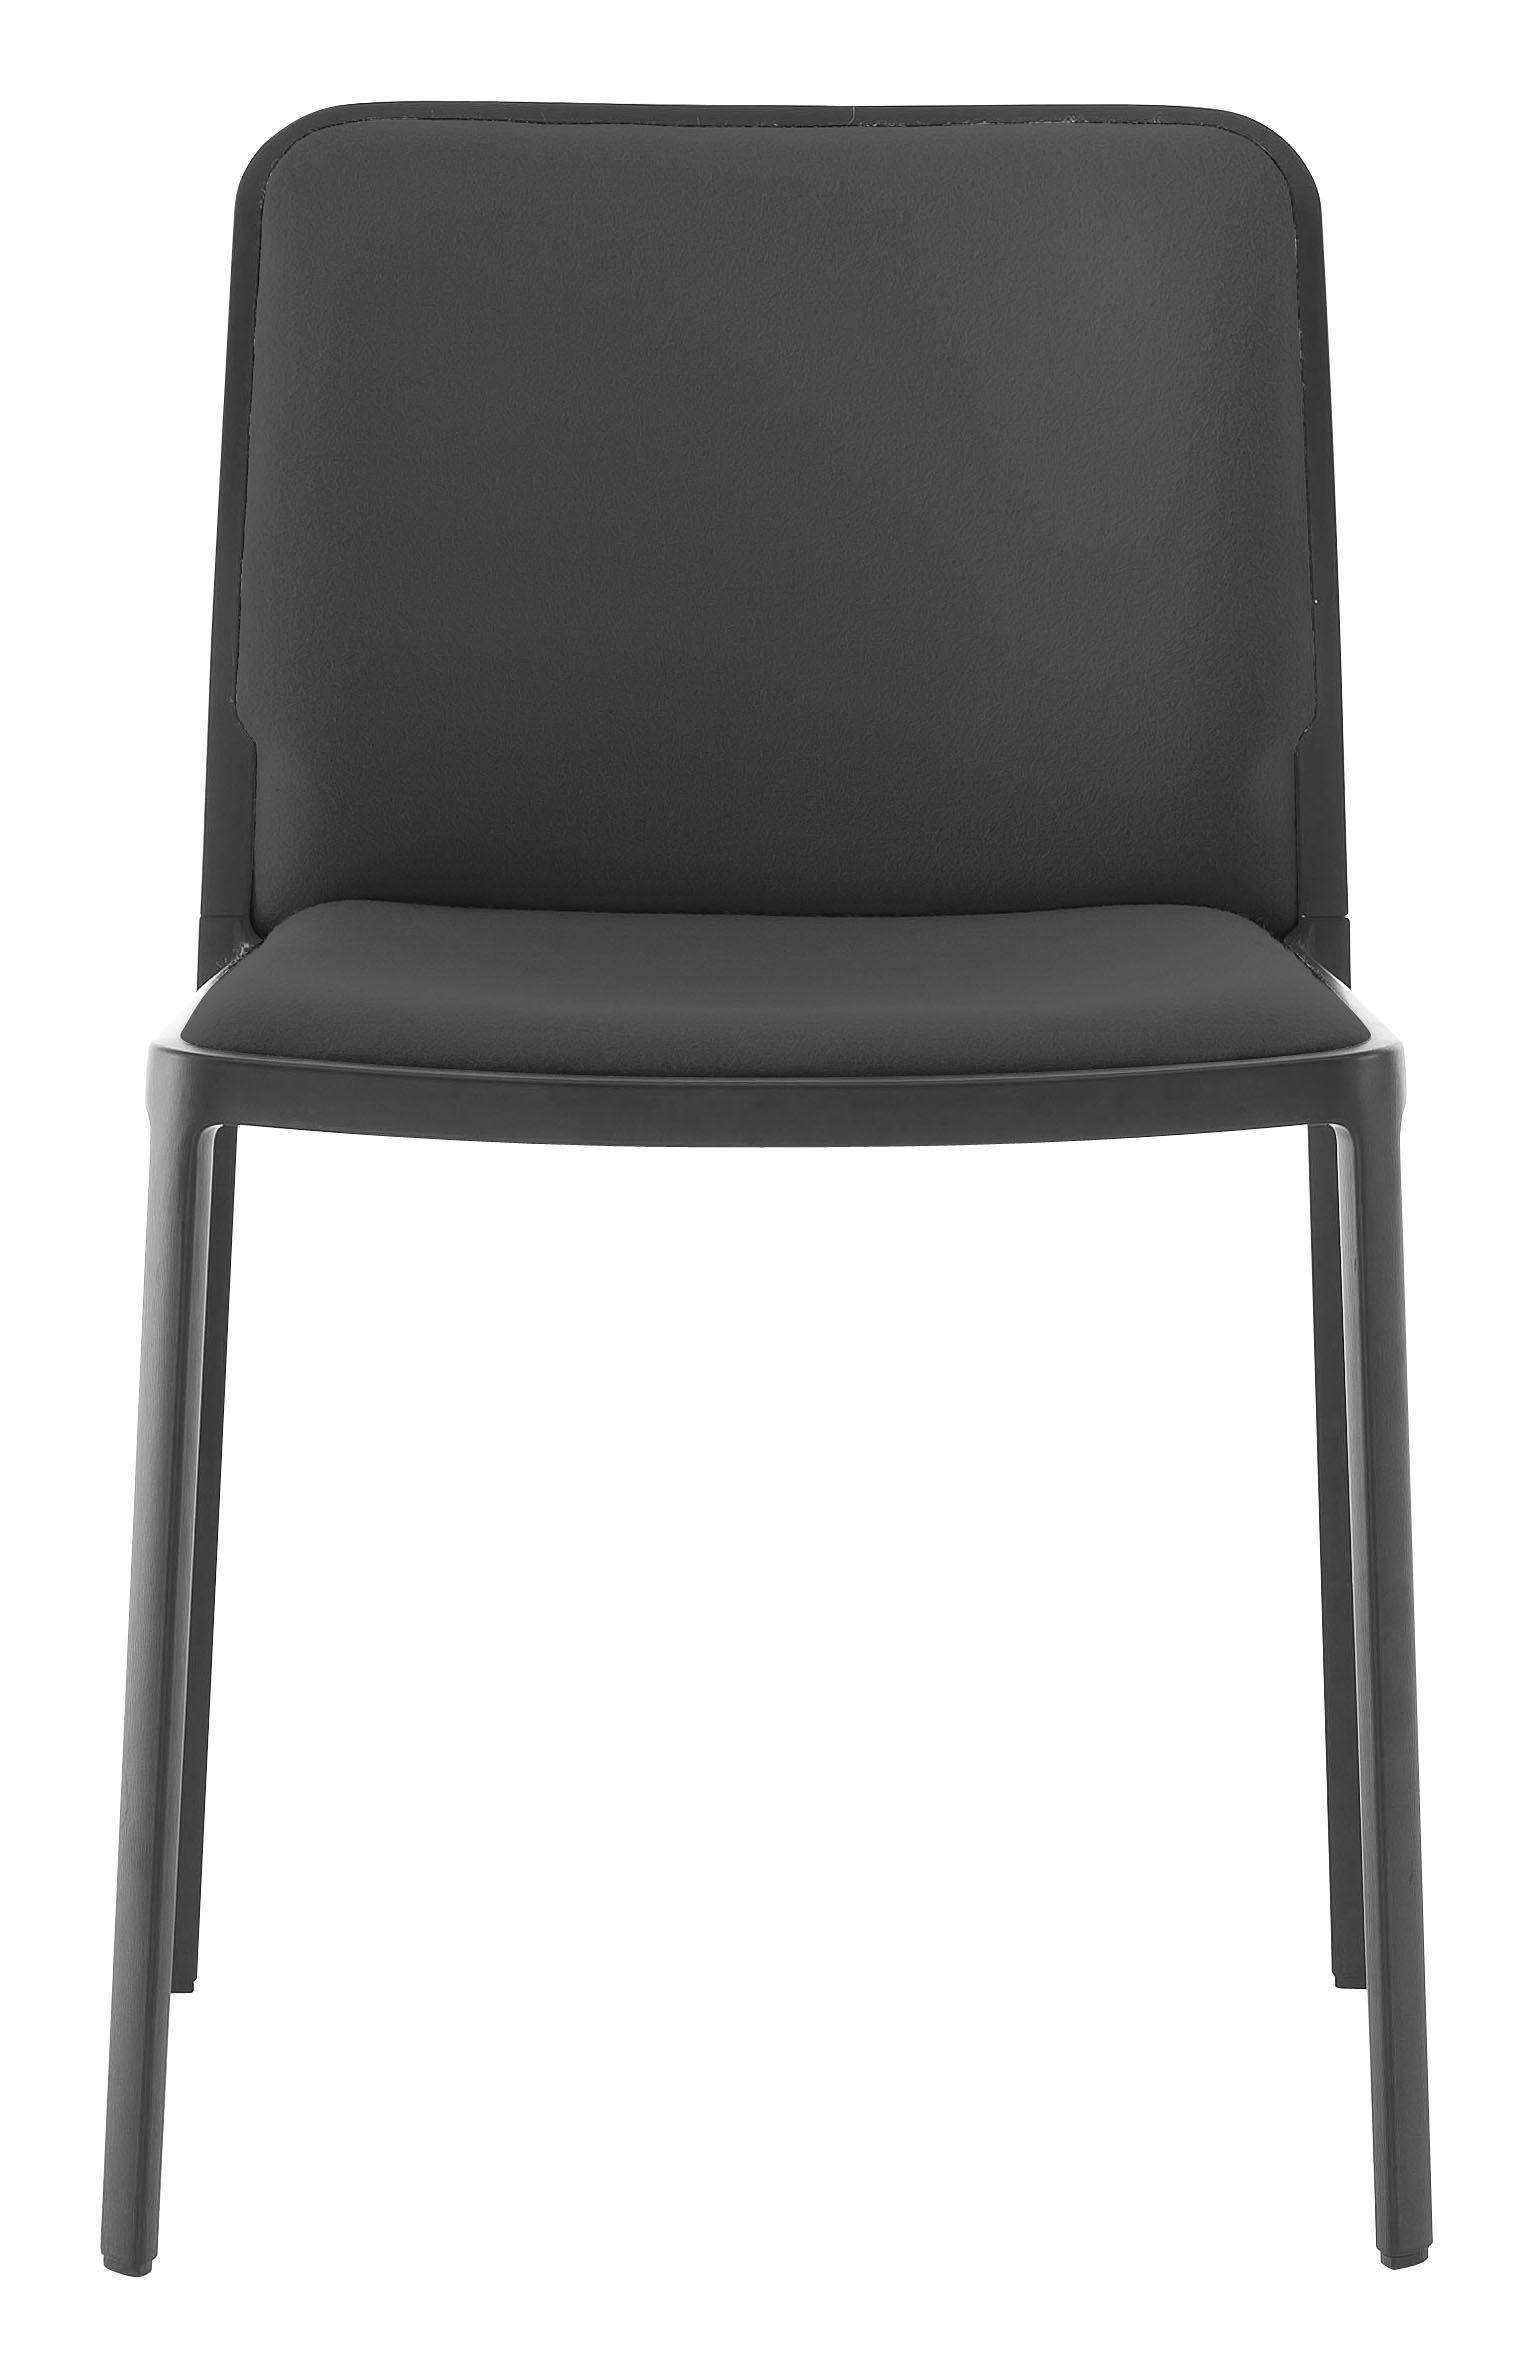 Möbel - Stühle  - Audrey Soft Gepolsterter Stuhl / Sitzfläche aus Stoff - Gestell lackiert - Kartell - Gestell: schwarz / Sitzfläche: Stoff schwarz - Gewebe, lackiertes Aluminium